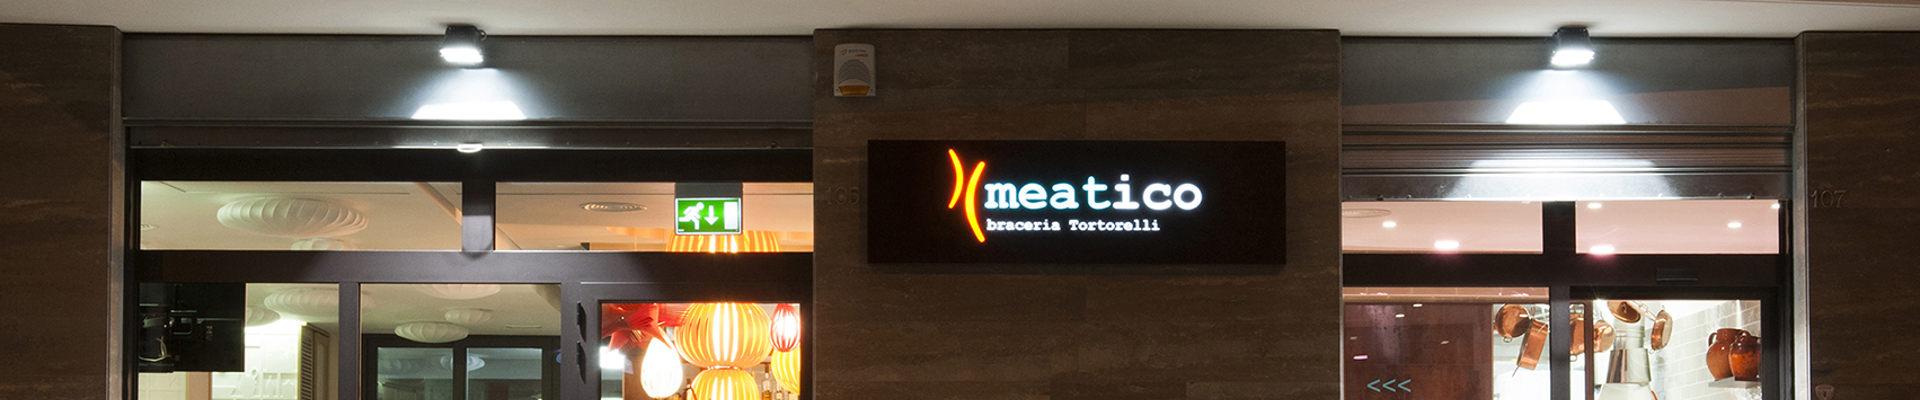 meatico-wall